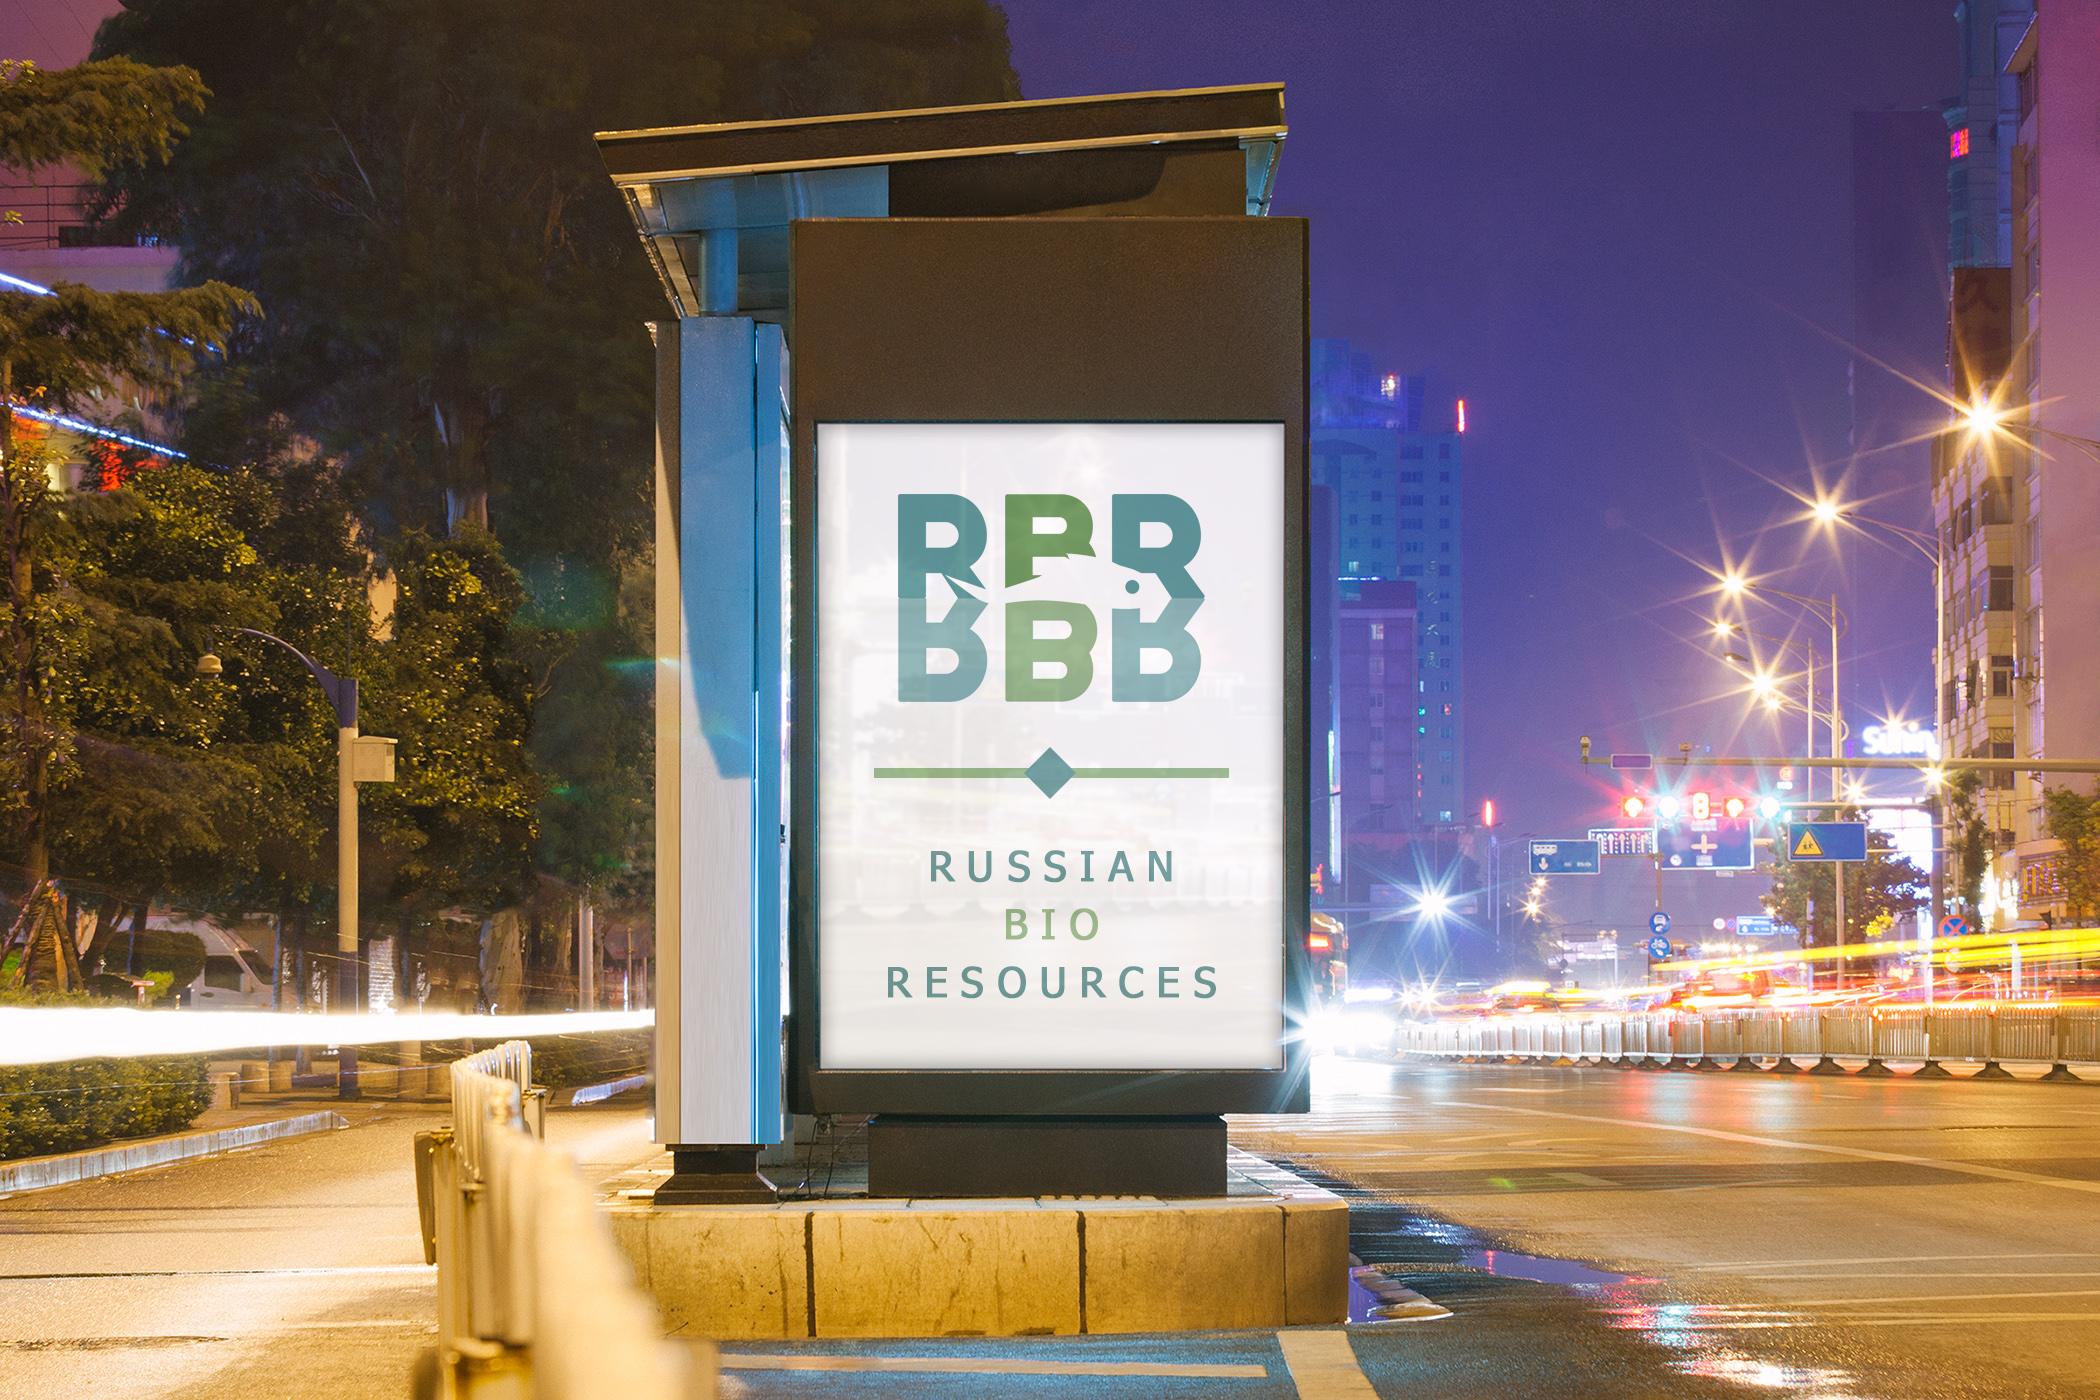 Разработка логотипа для компании «Русские Био Ресурсы» фото f_75058f7f9b901d97.jpg